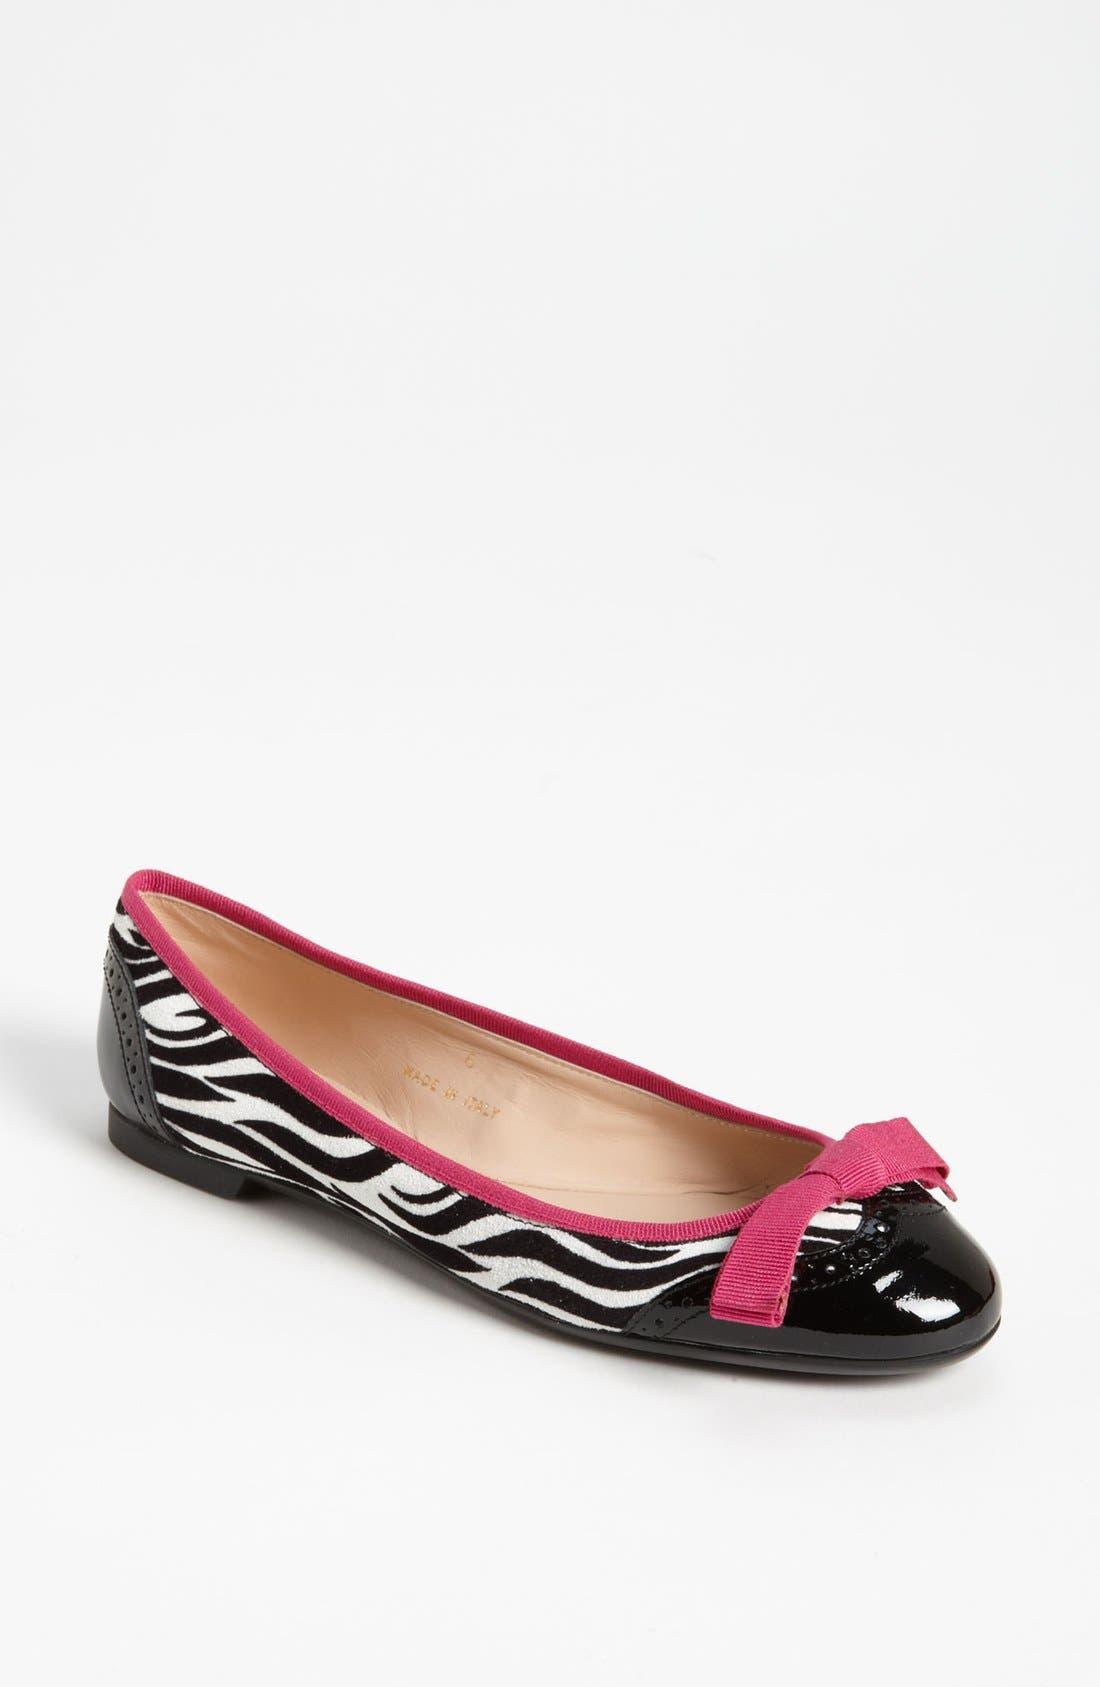 Alternate Image 1 Selected - Sweet Ballerina 'Biancospino' Zebra Print Ballet Flat